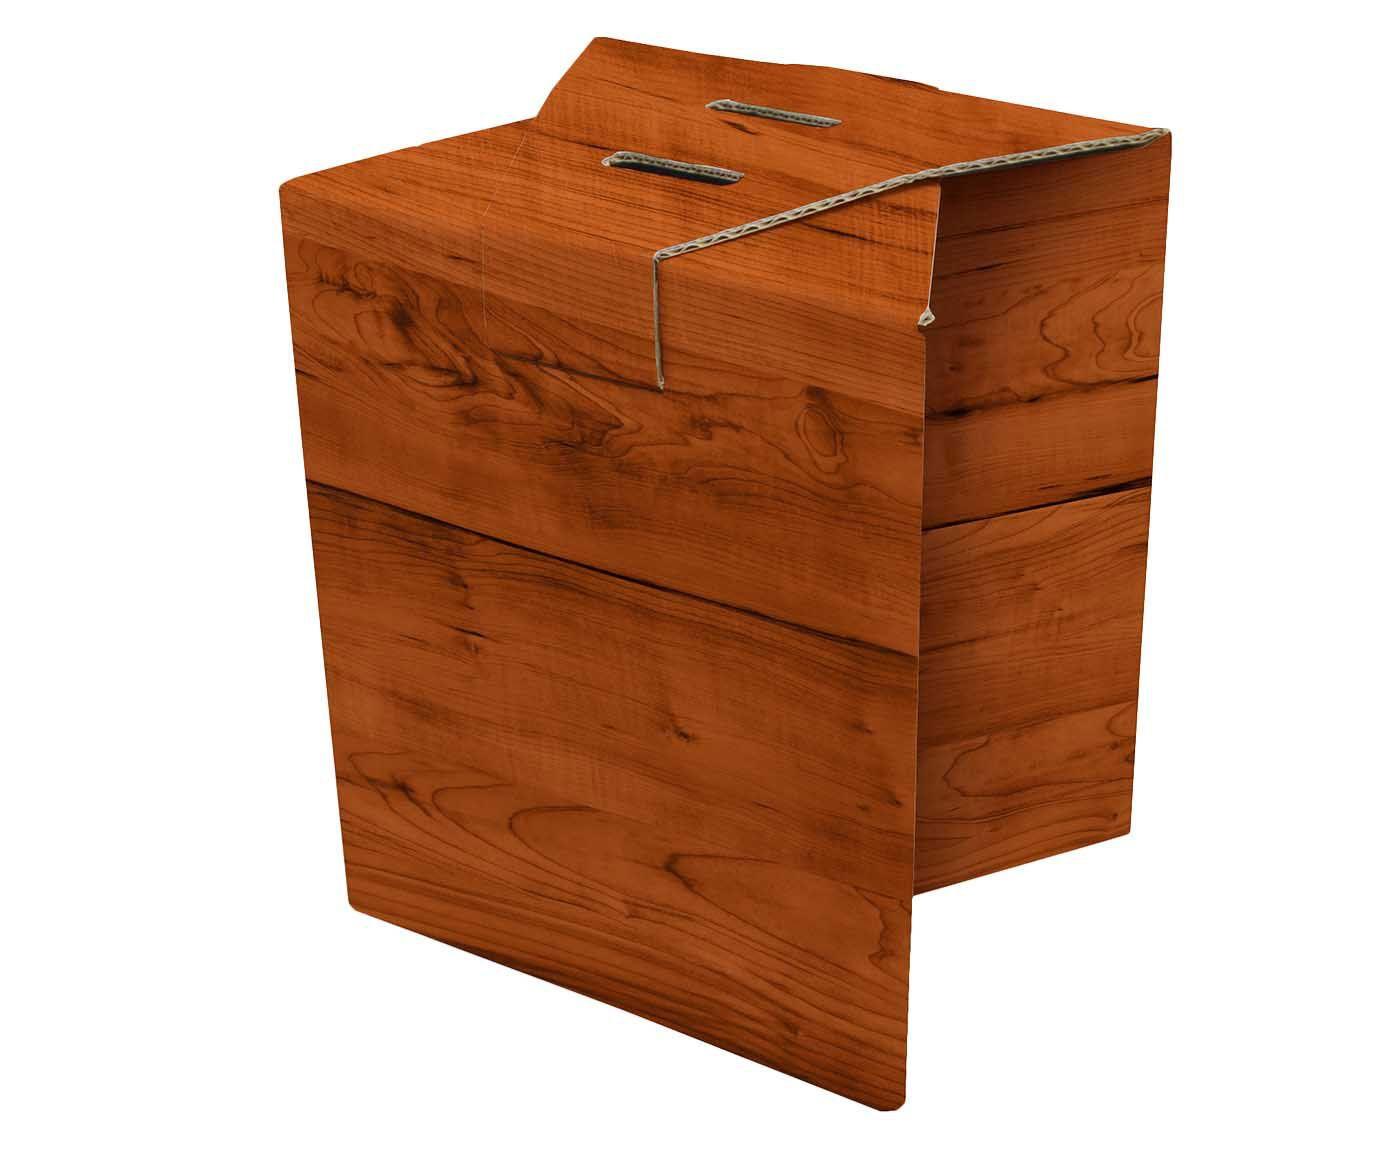 Banco rube wood   Westwing.com.br